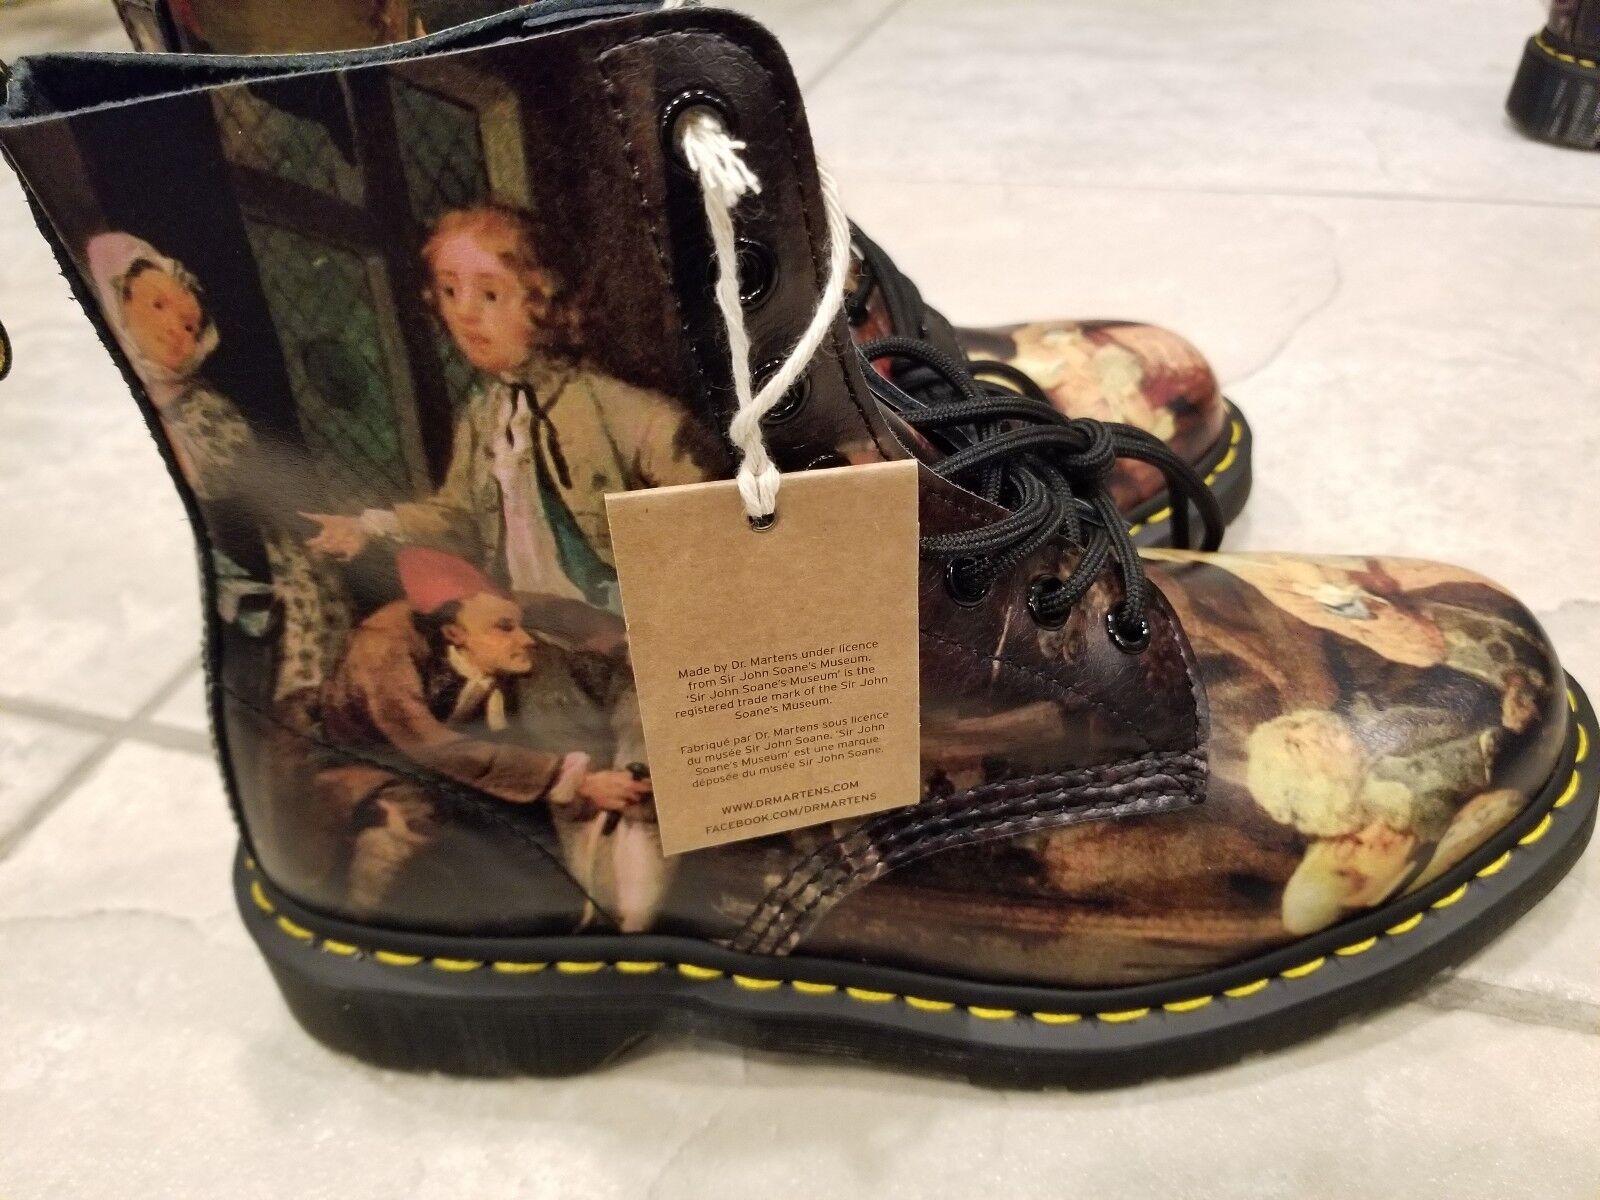 Dr Martens Uomo 13 Stivali Size Renaissance Artist Hogarth Pascal